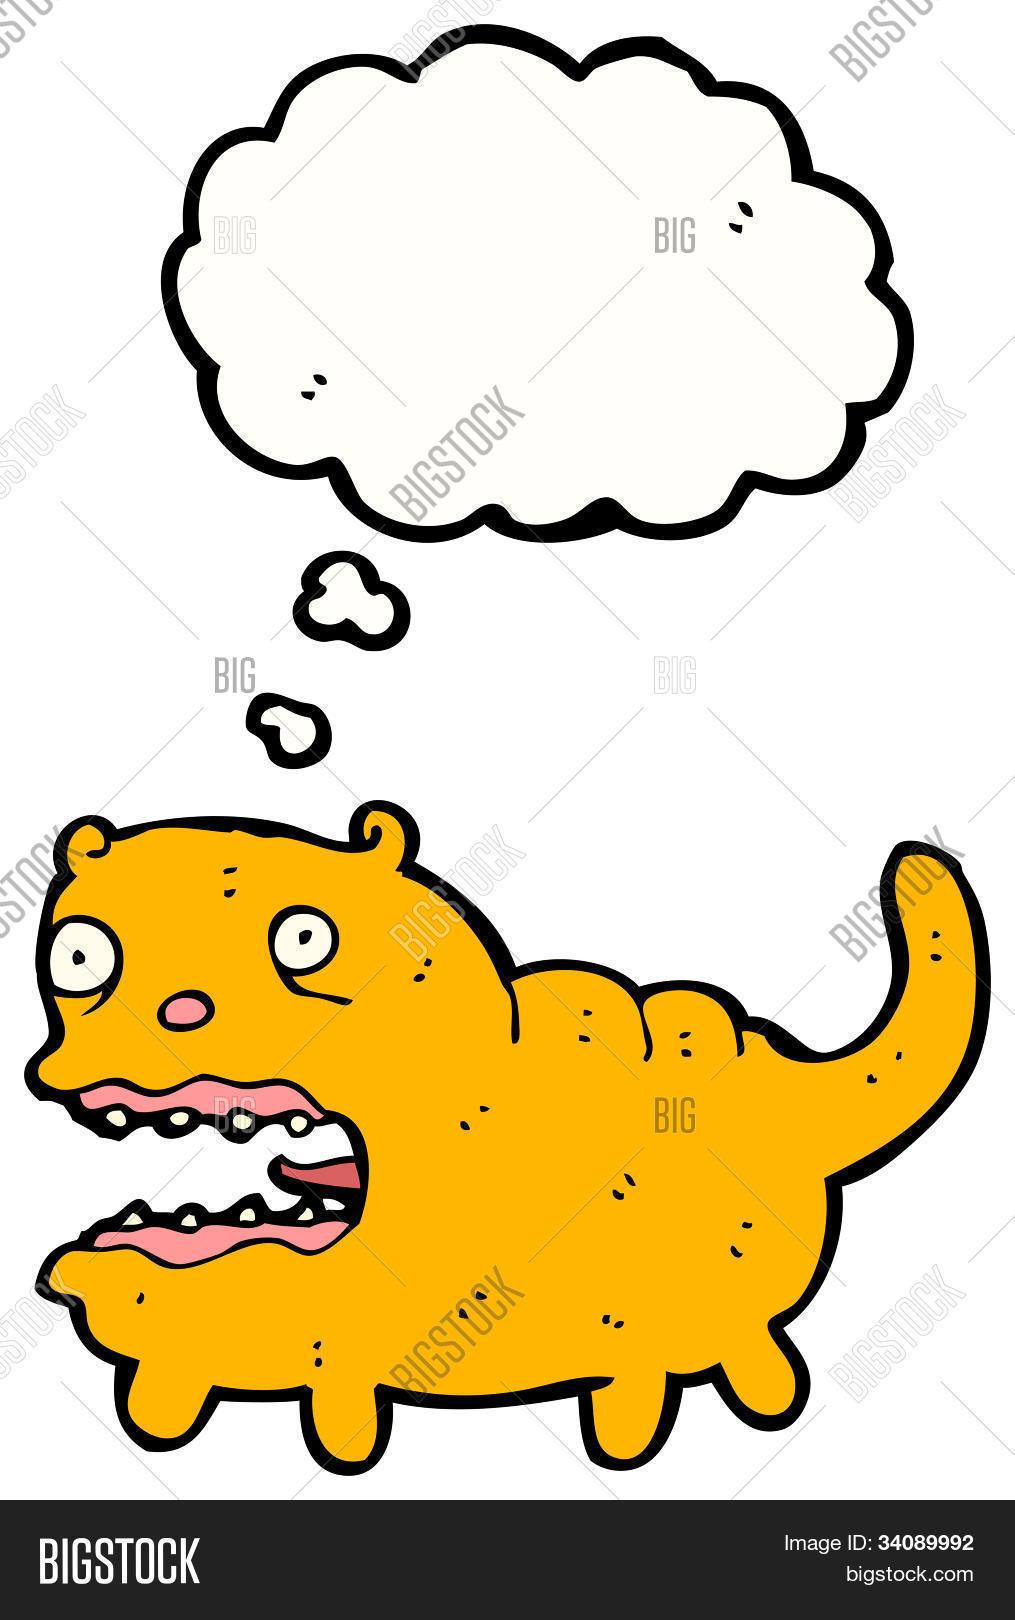 Cartoon Ugly Cat Image Photo Free Trial Bigstock